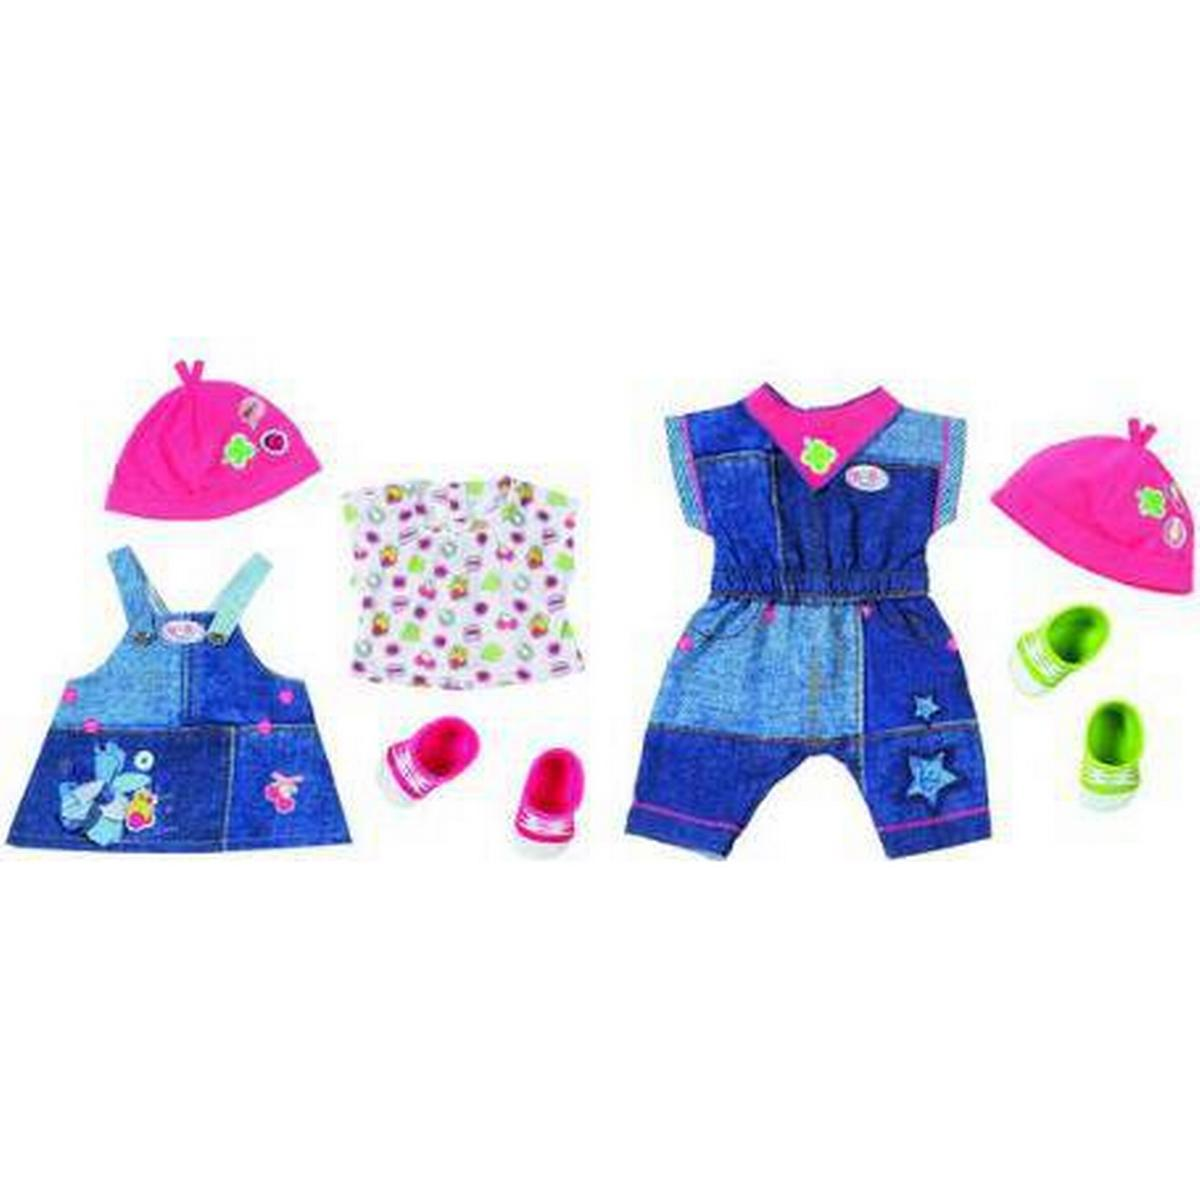 32f89579f5c Baby Born Dukketøj - Sammenlign priser hos PriceRunner